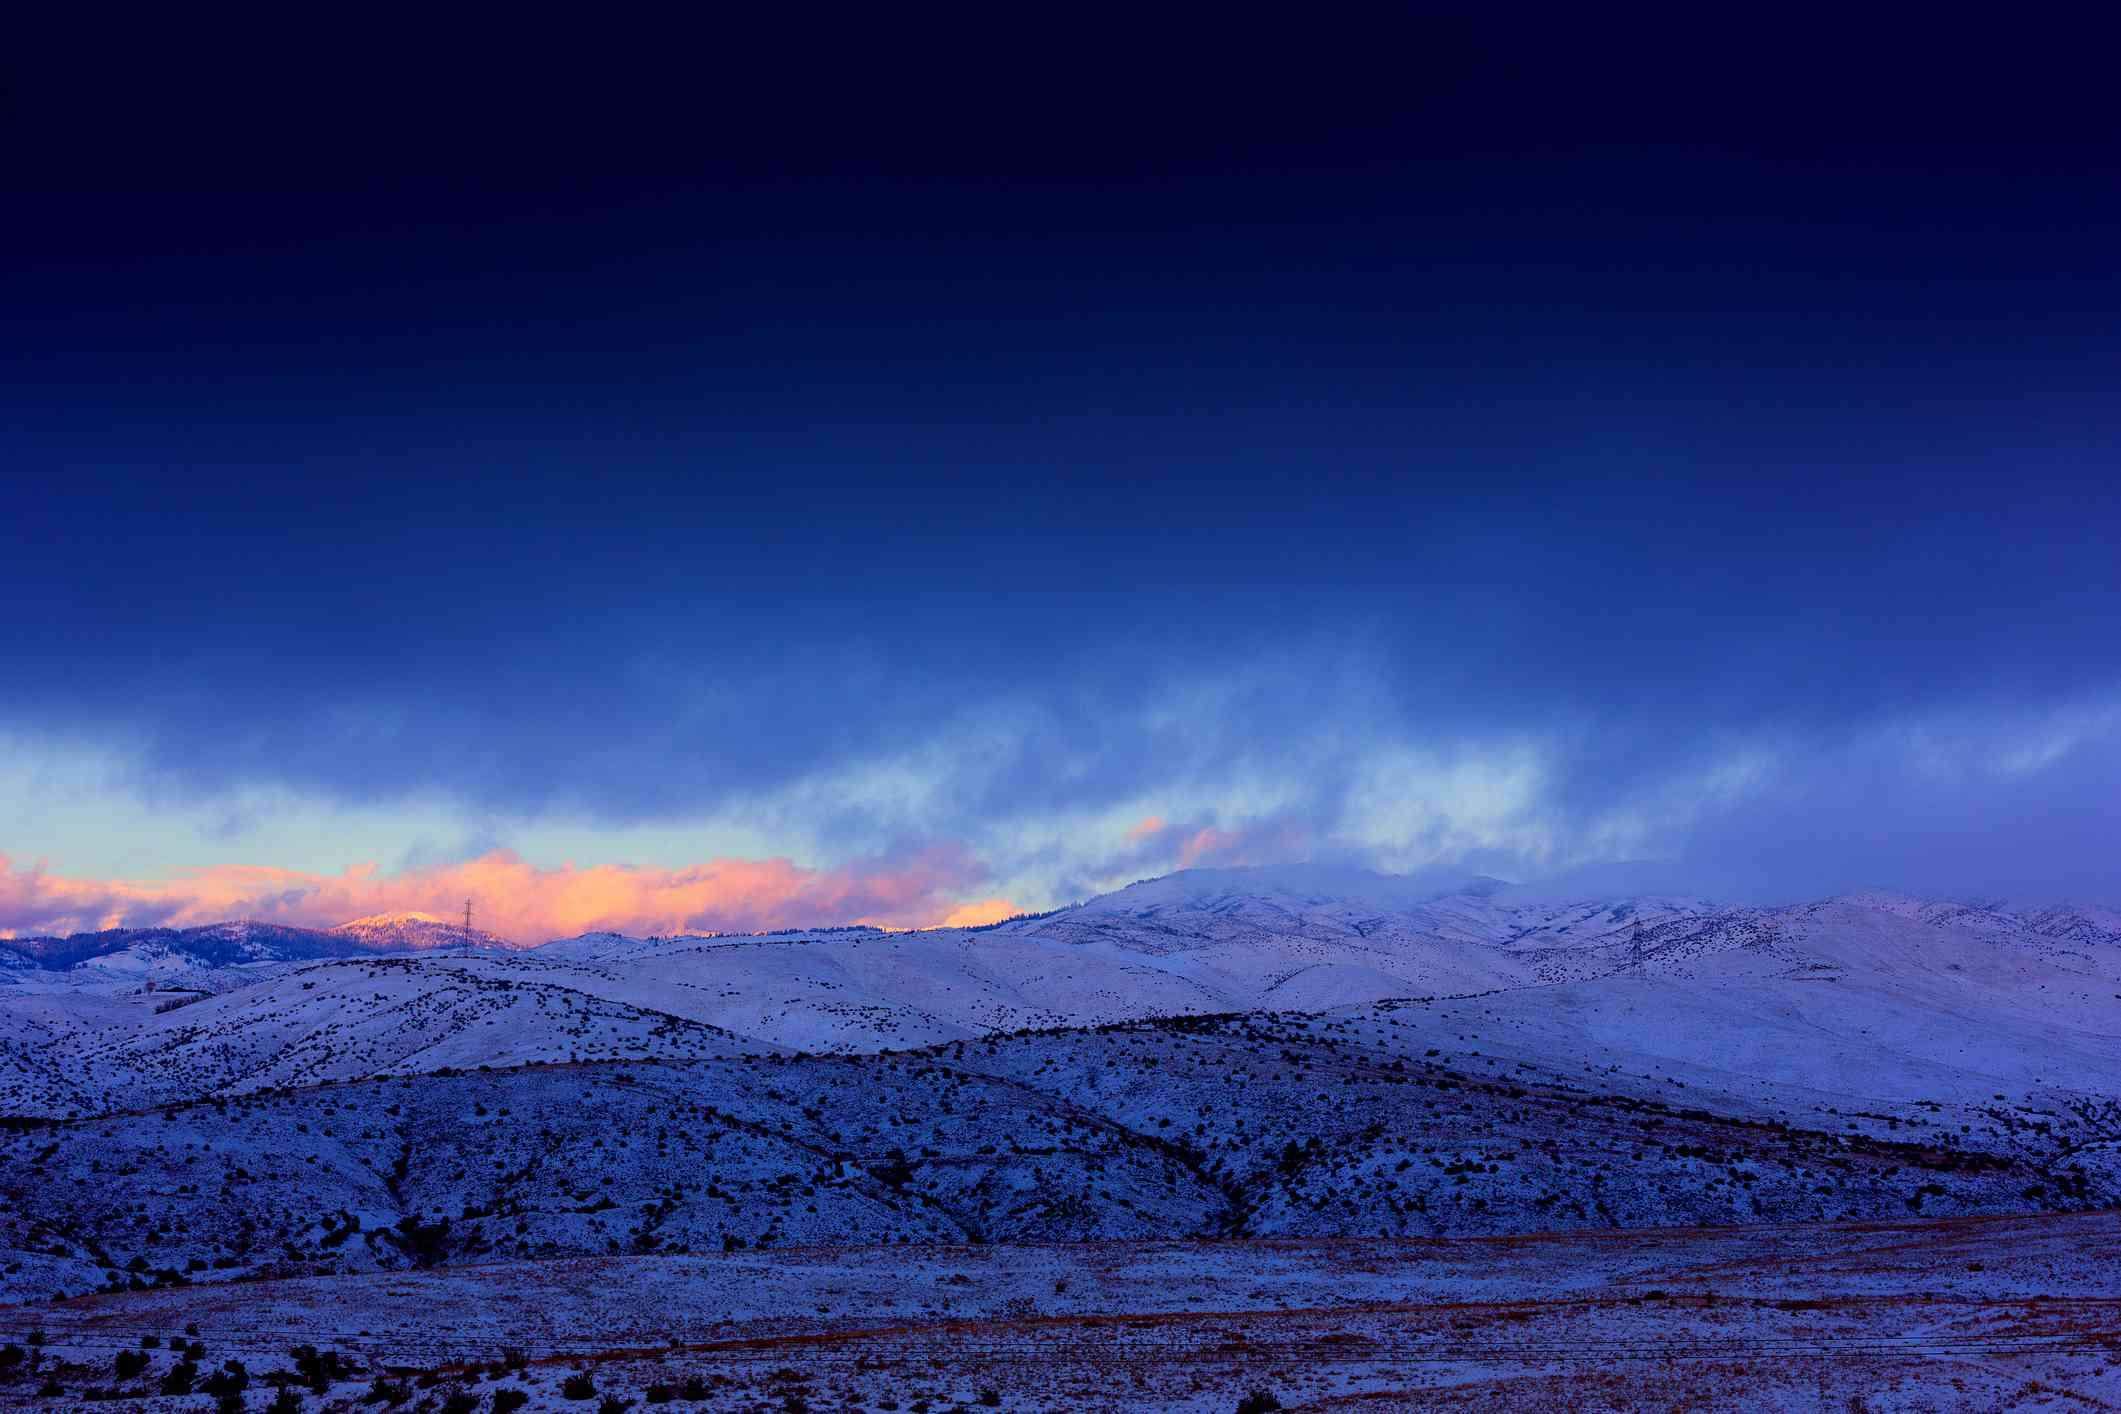 Vivid winter sunset over snowy Boise foothills and Bogus Basin ski resort, Idaho